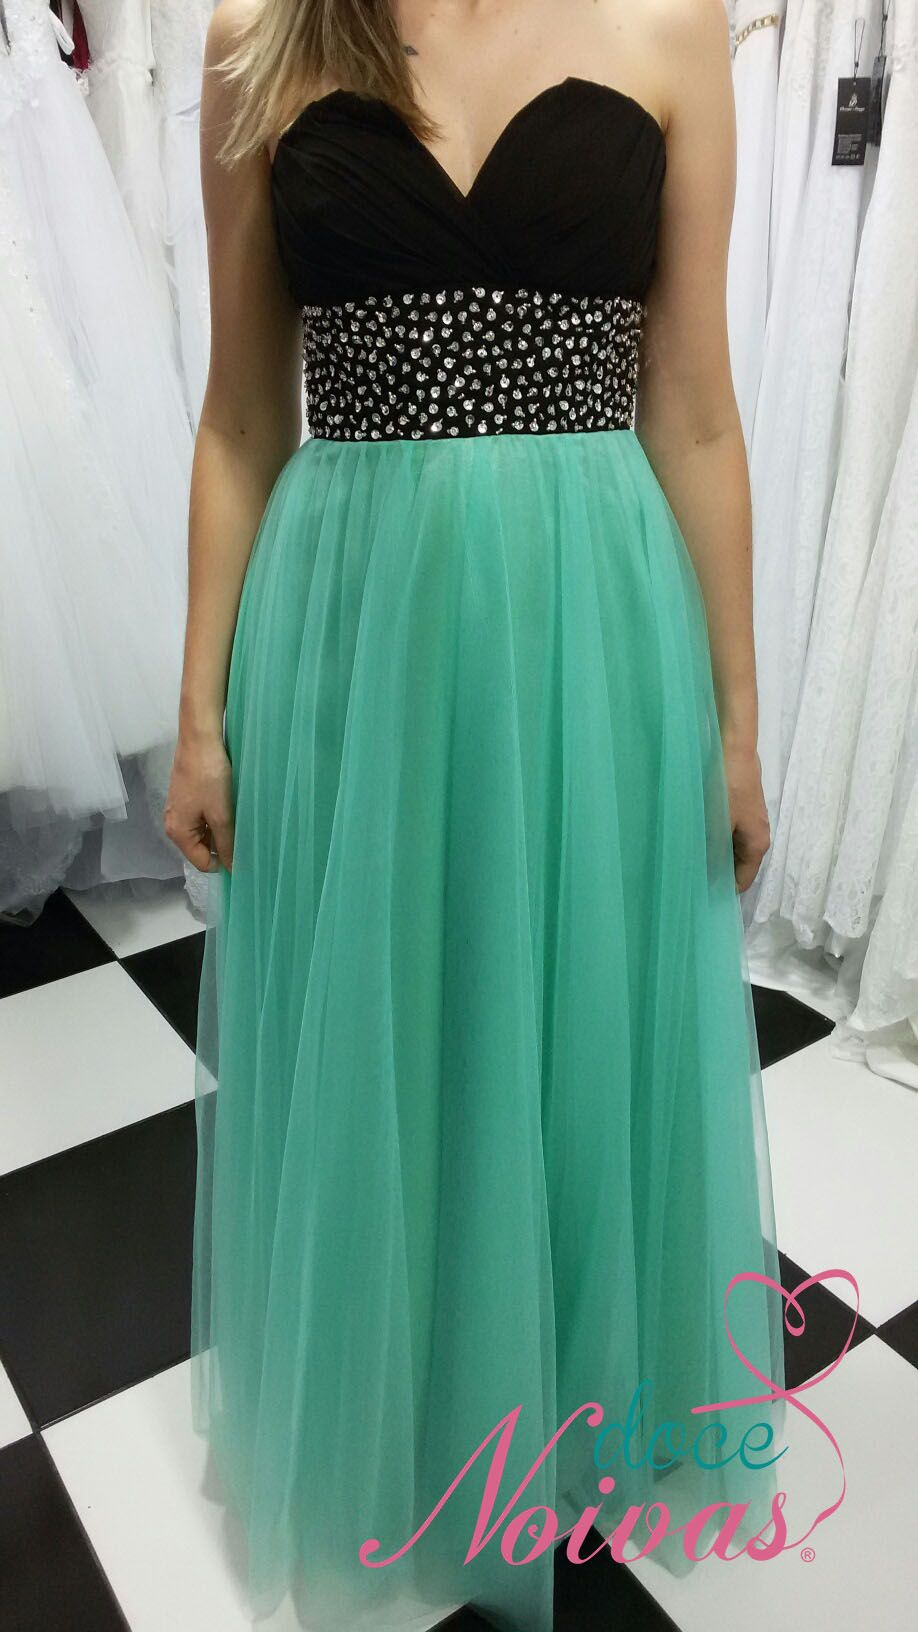 Vestido Festa Verde Tiffany com Preto